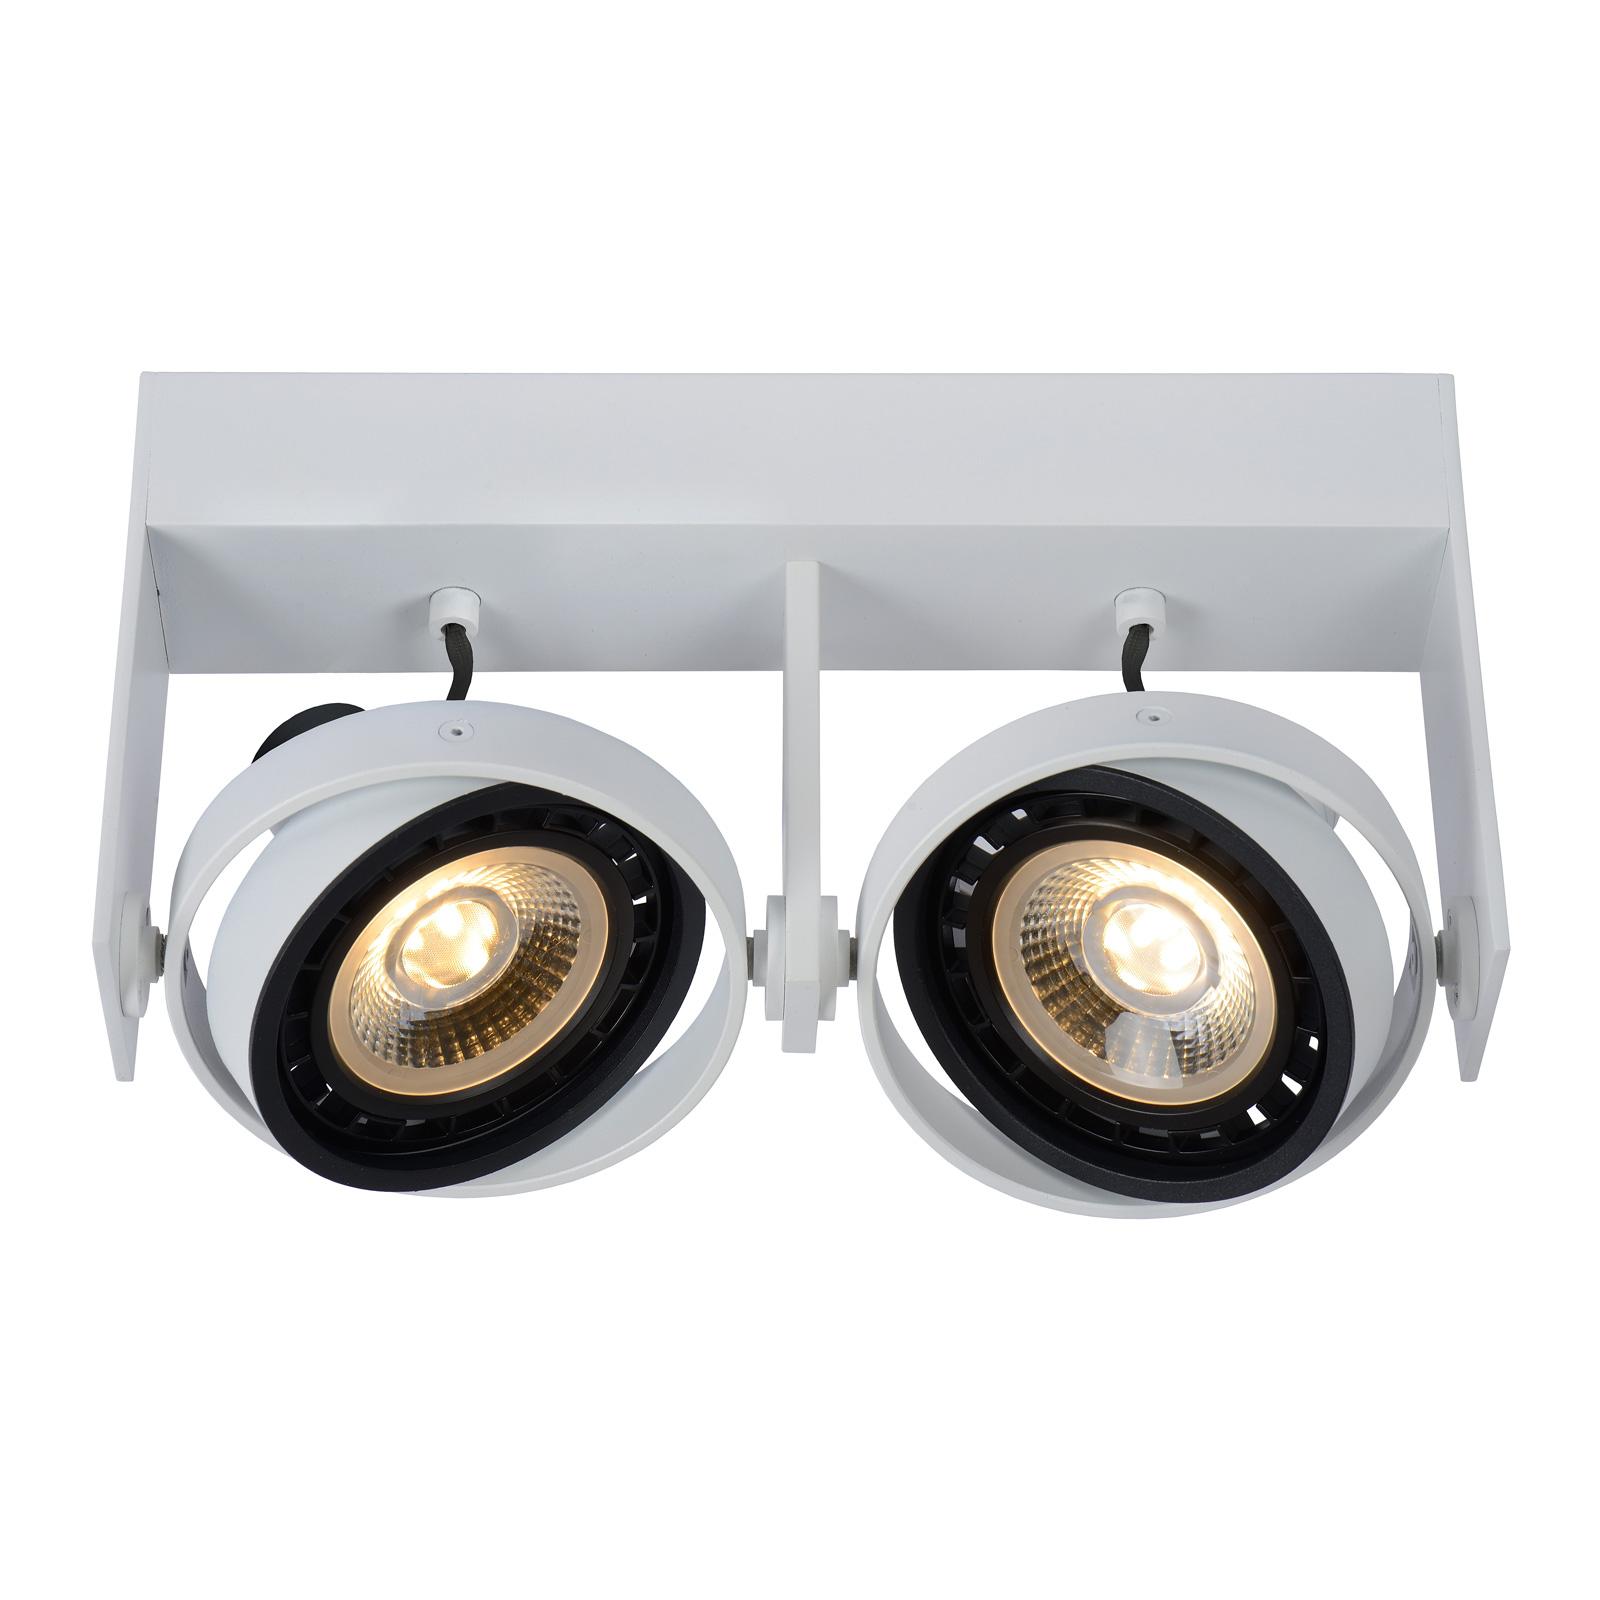 Griffon LED-takspot hvit, 2 lyskilder